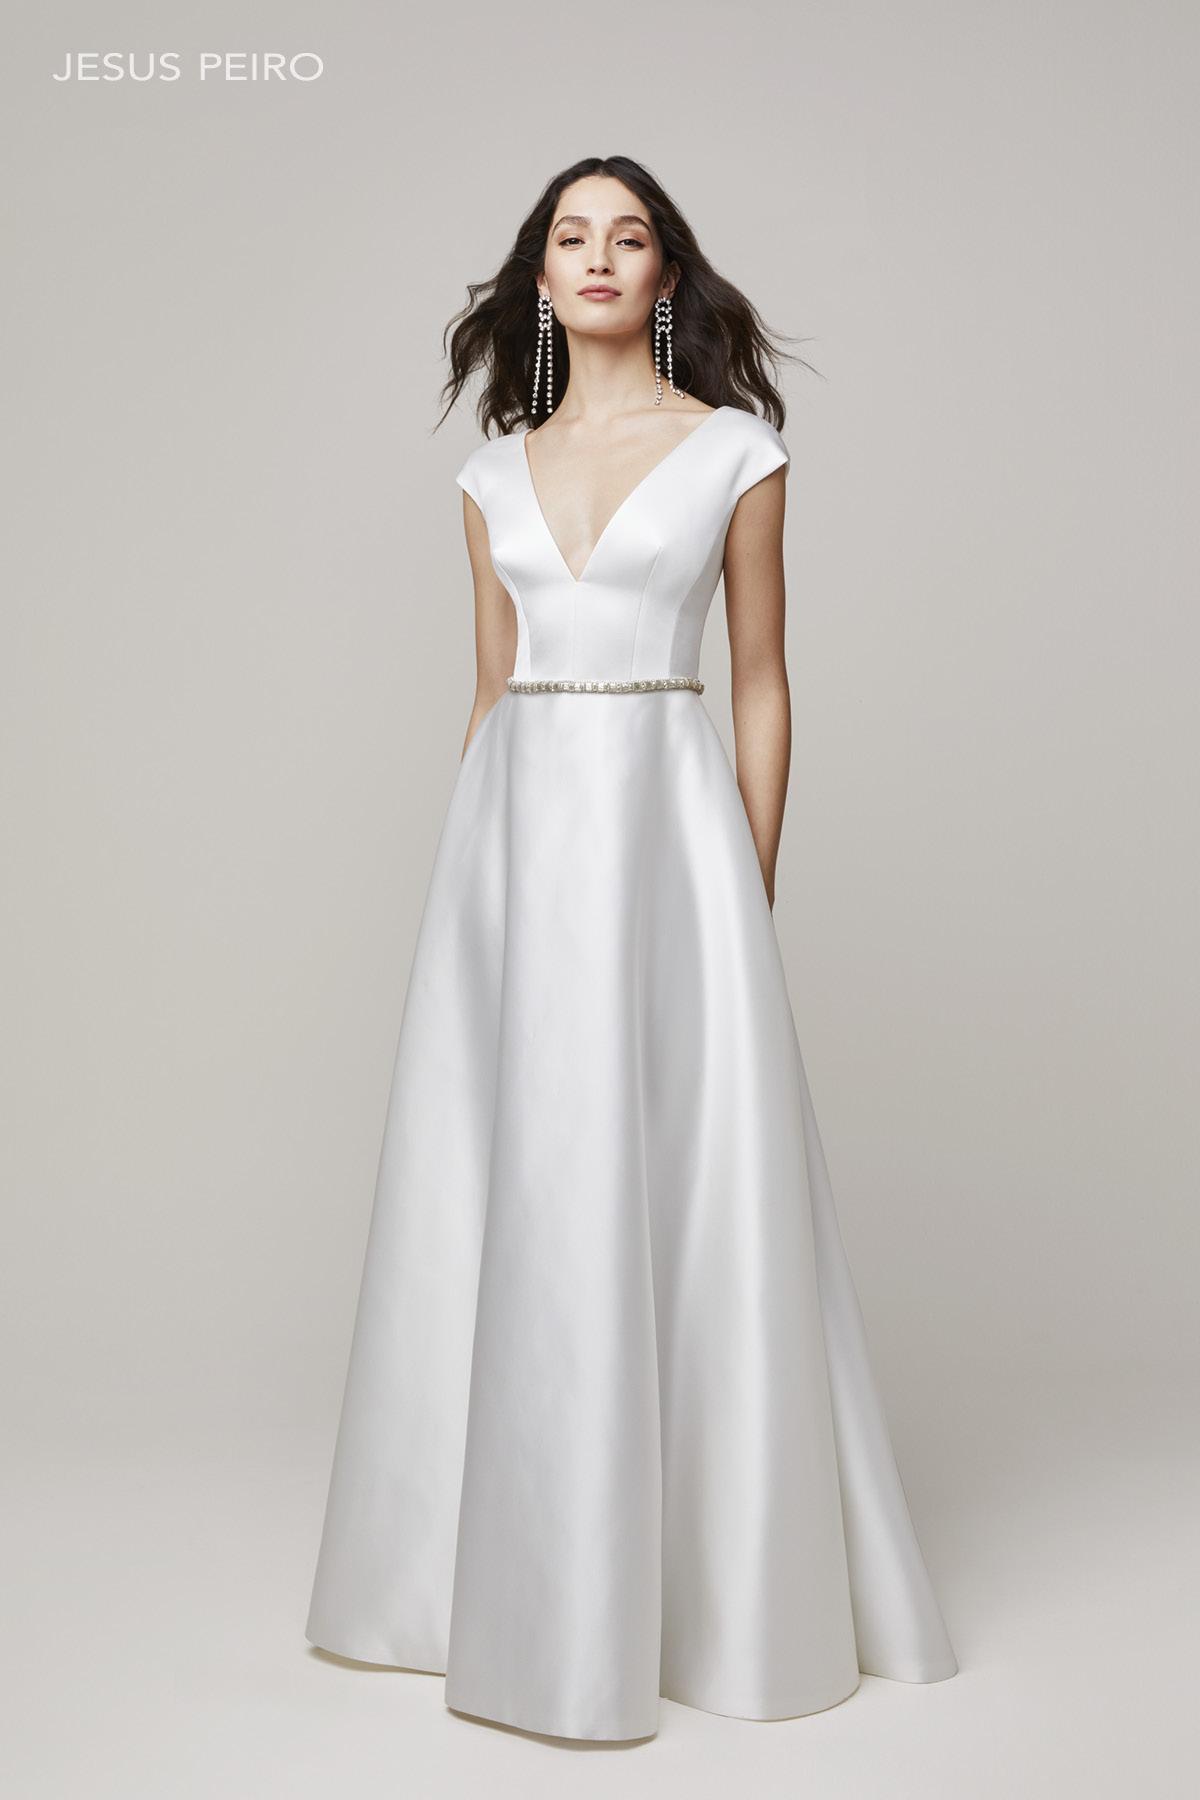 Vestido novia Jesús Peiró Ref.2221